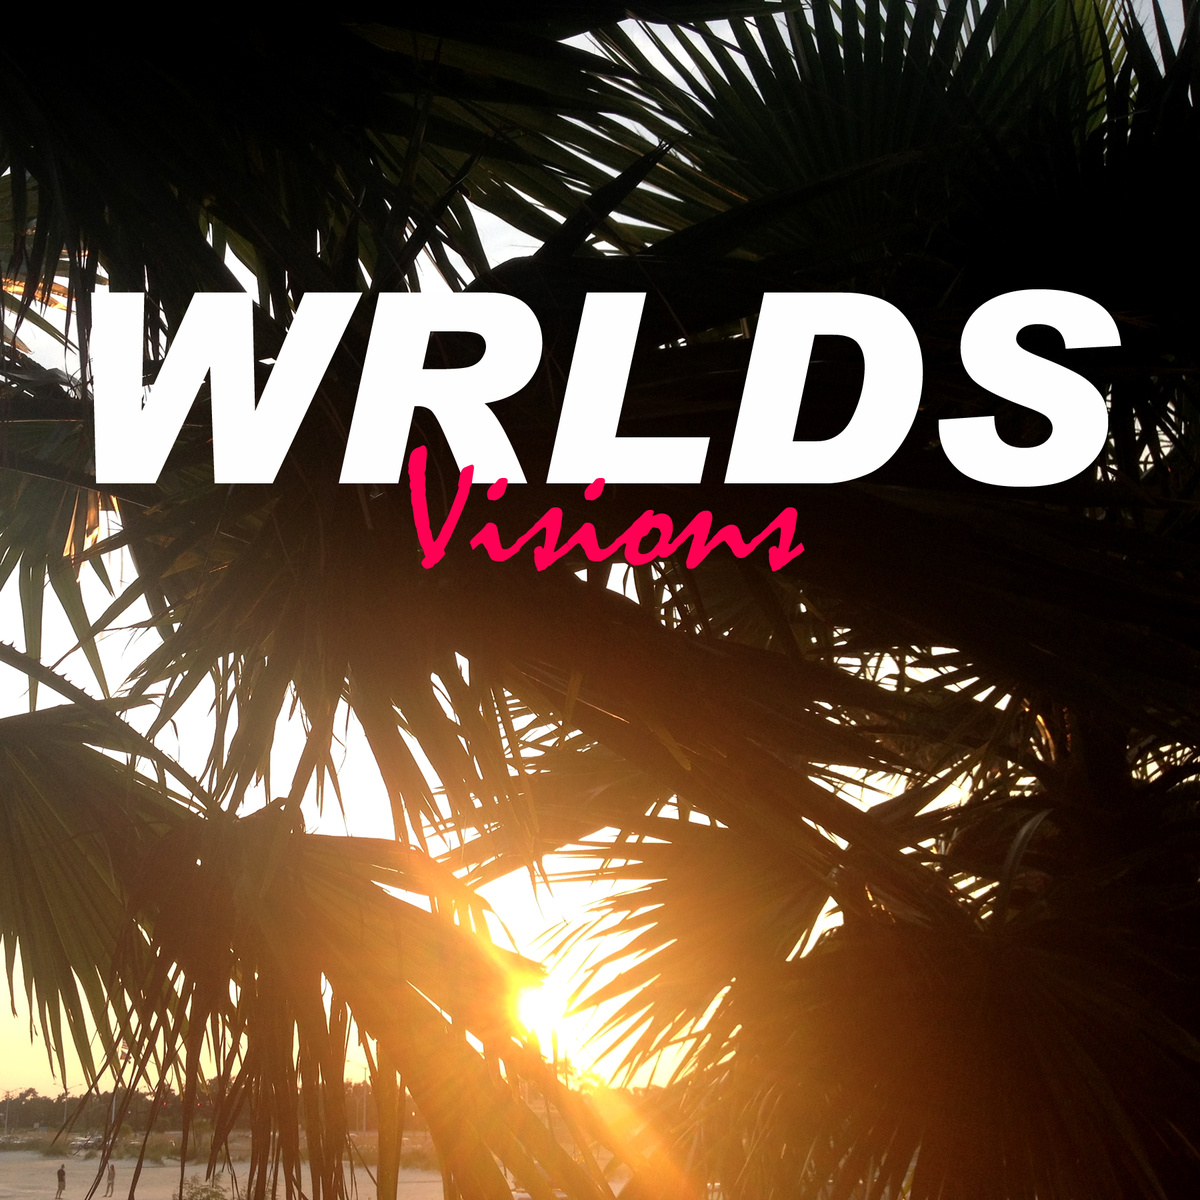 WRLDS visions